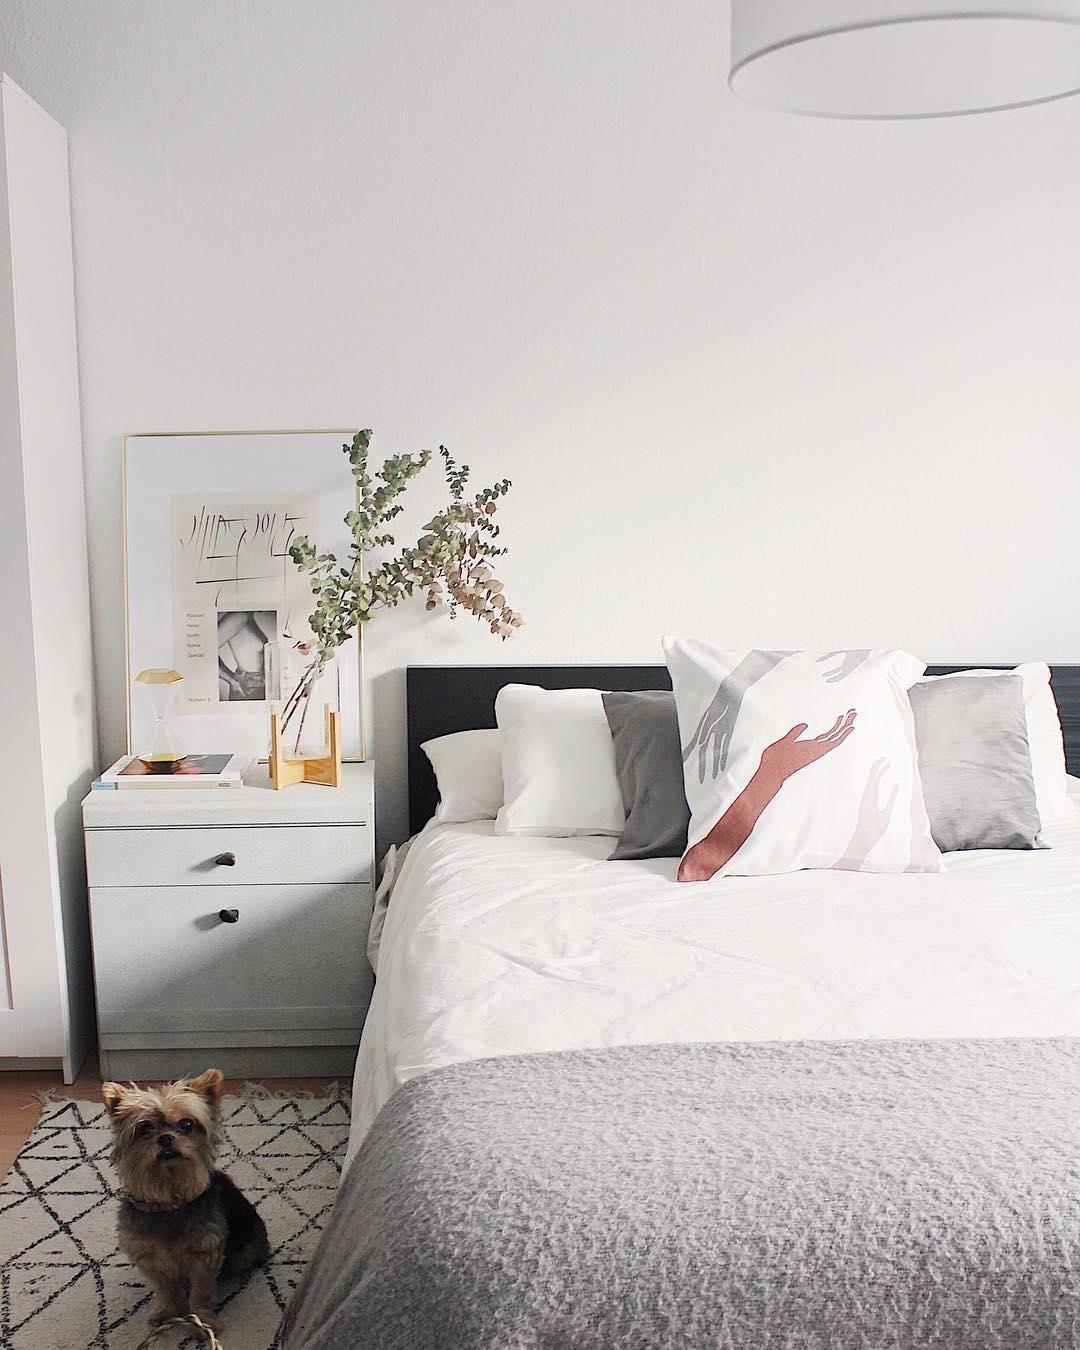 plaid madison in 2019 ab ins bett pinterest schlafzimmer schlafzimmer bett and bett. Black Bedroom Furniture Sets. Home Design Ideas